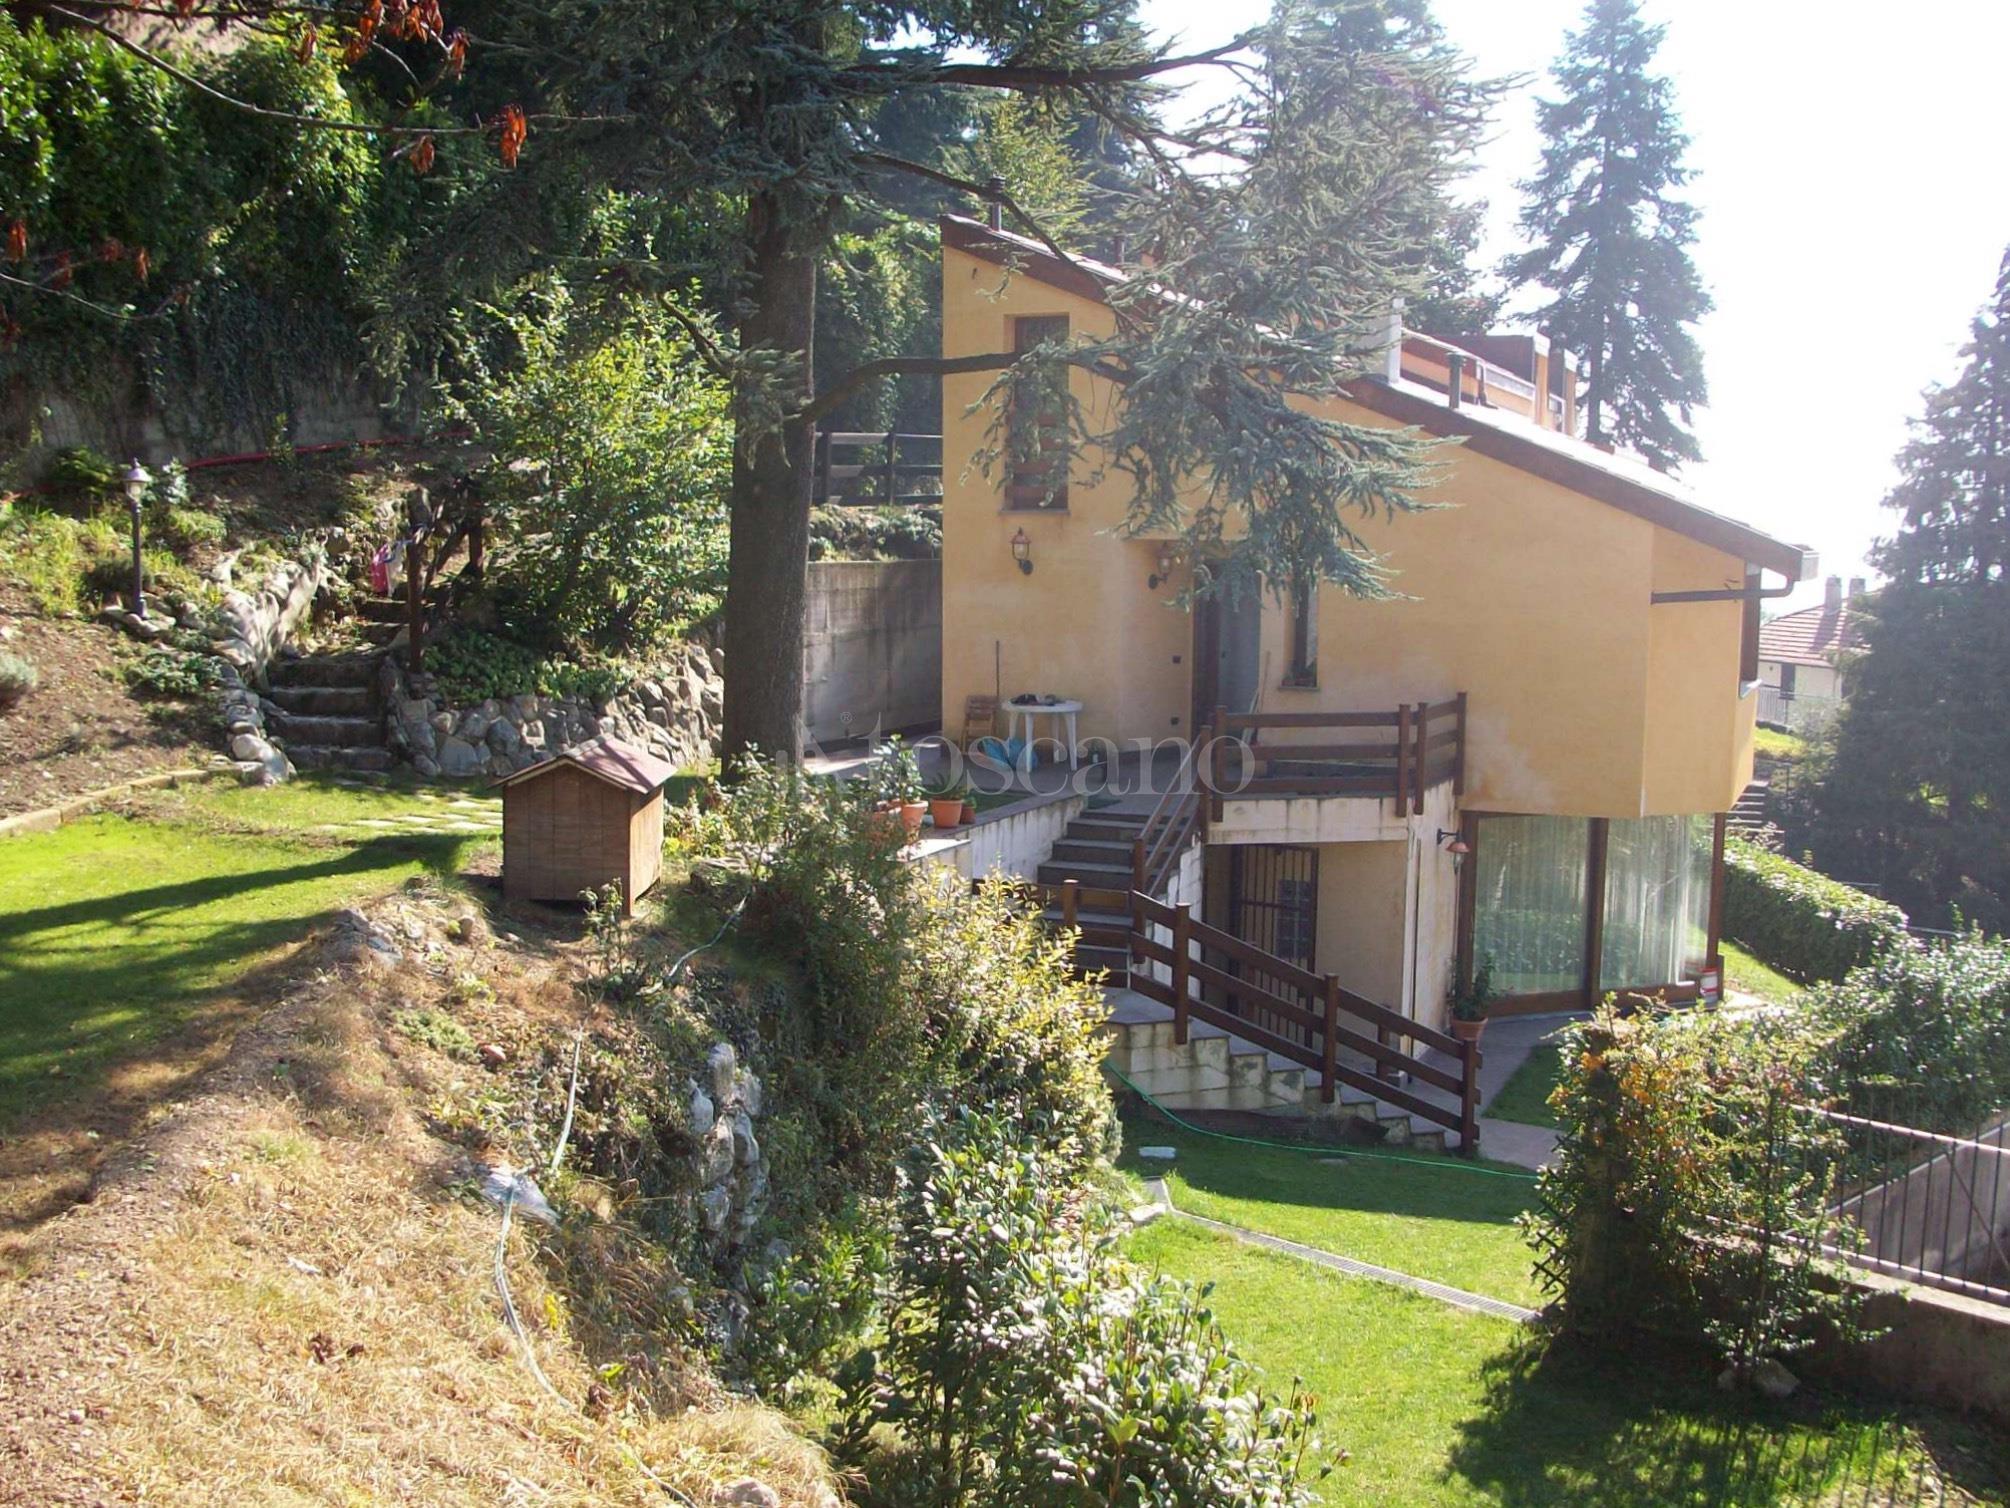 Vendita villa a brunate in via ai piani brunate 68 2017 for Piani di casa di roccia del fiume